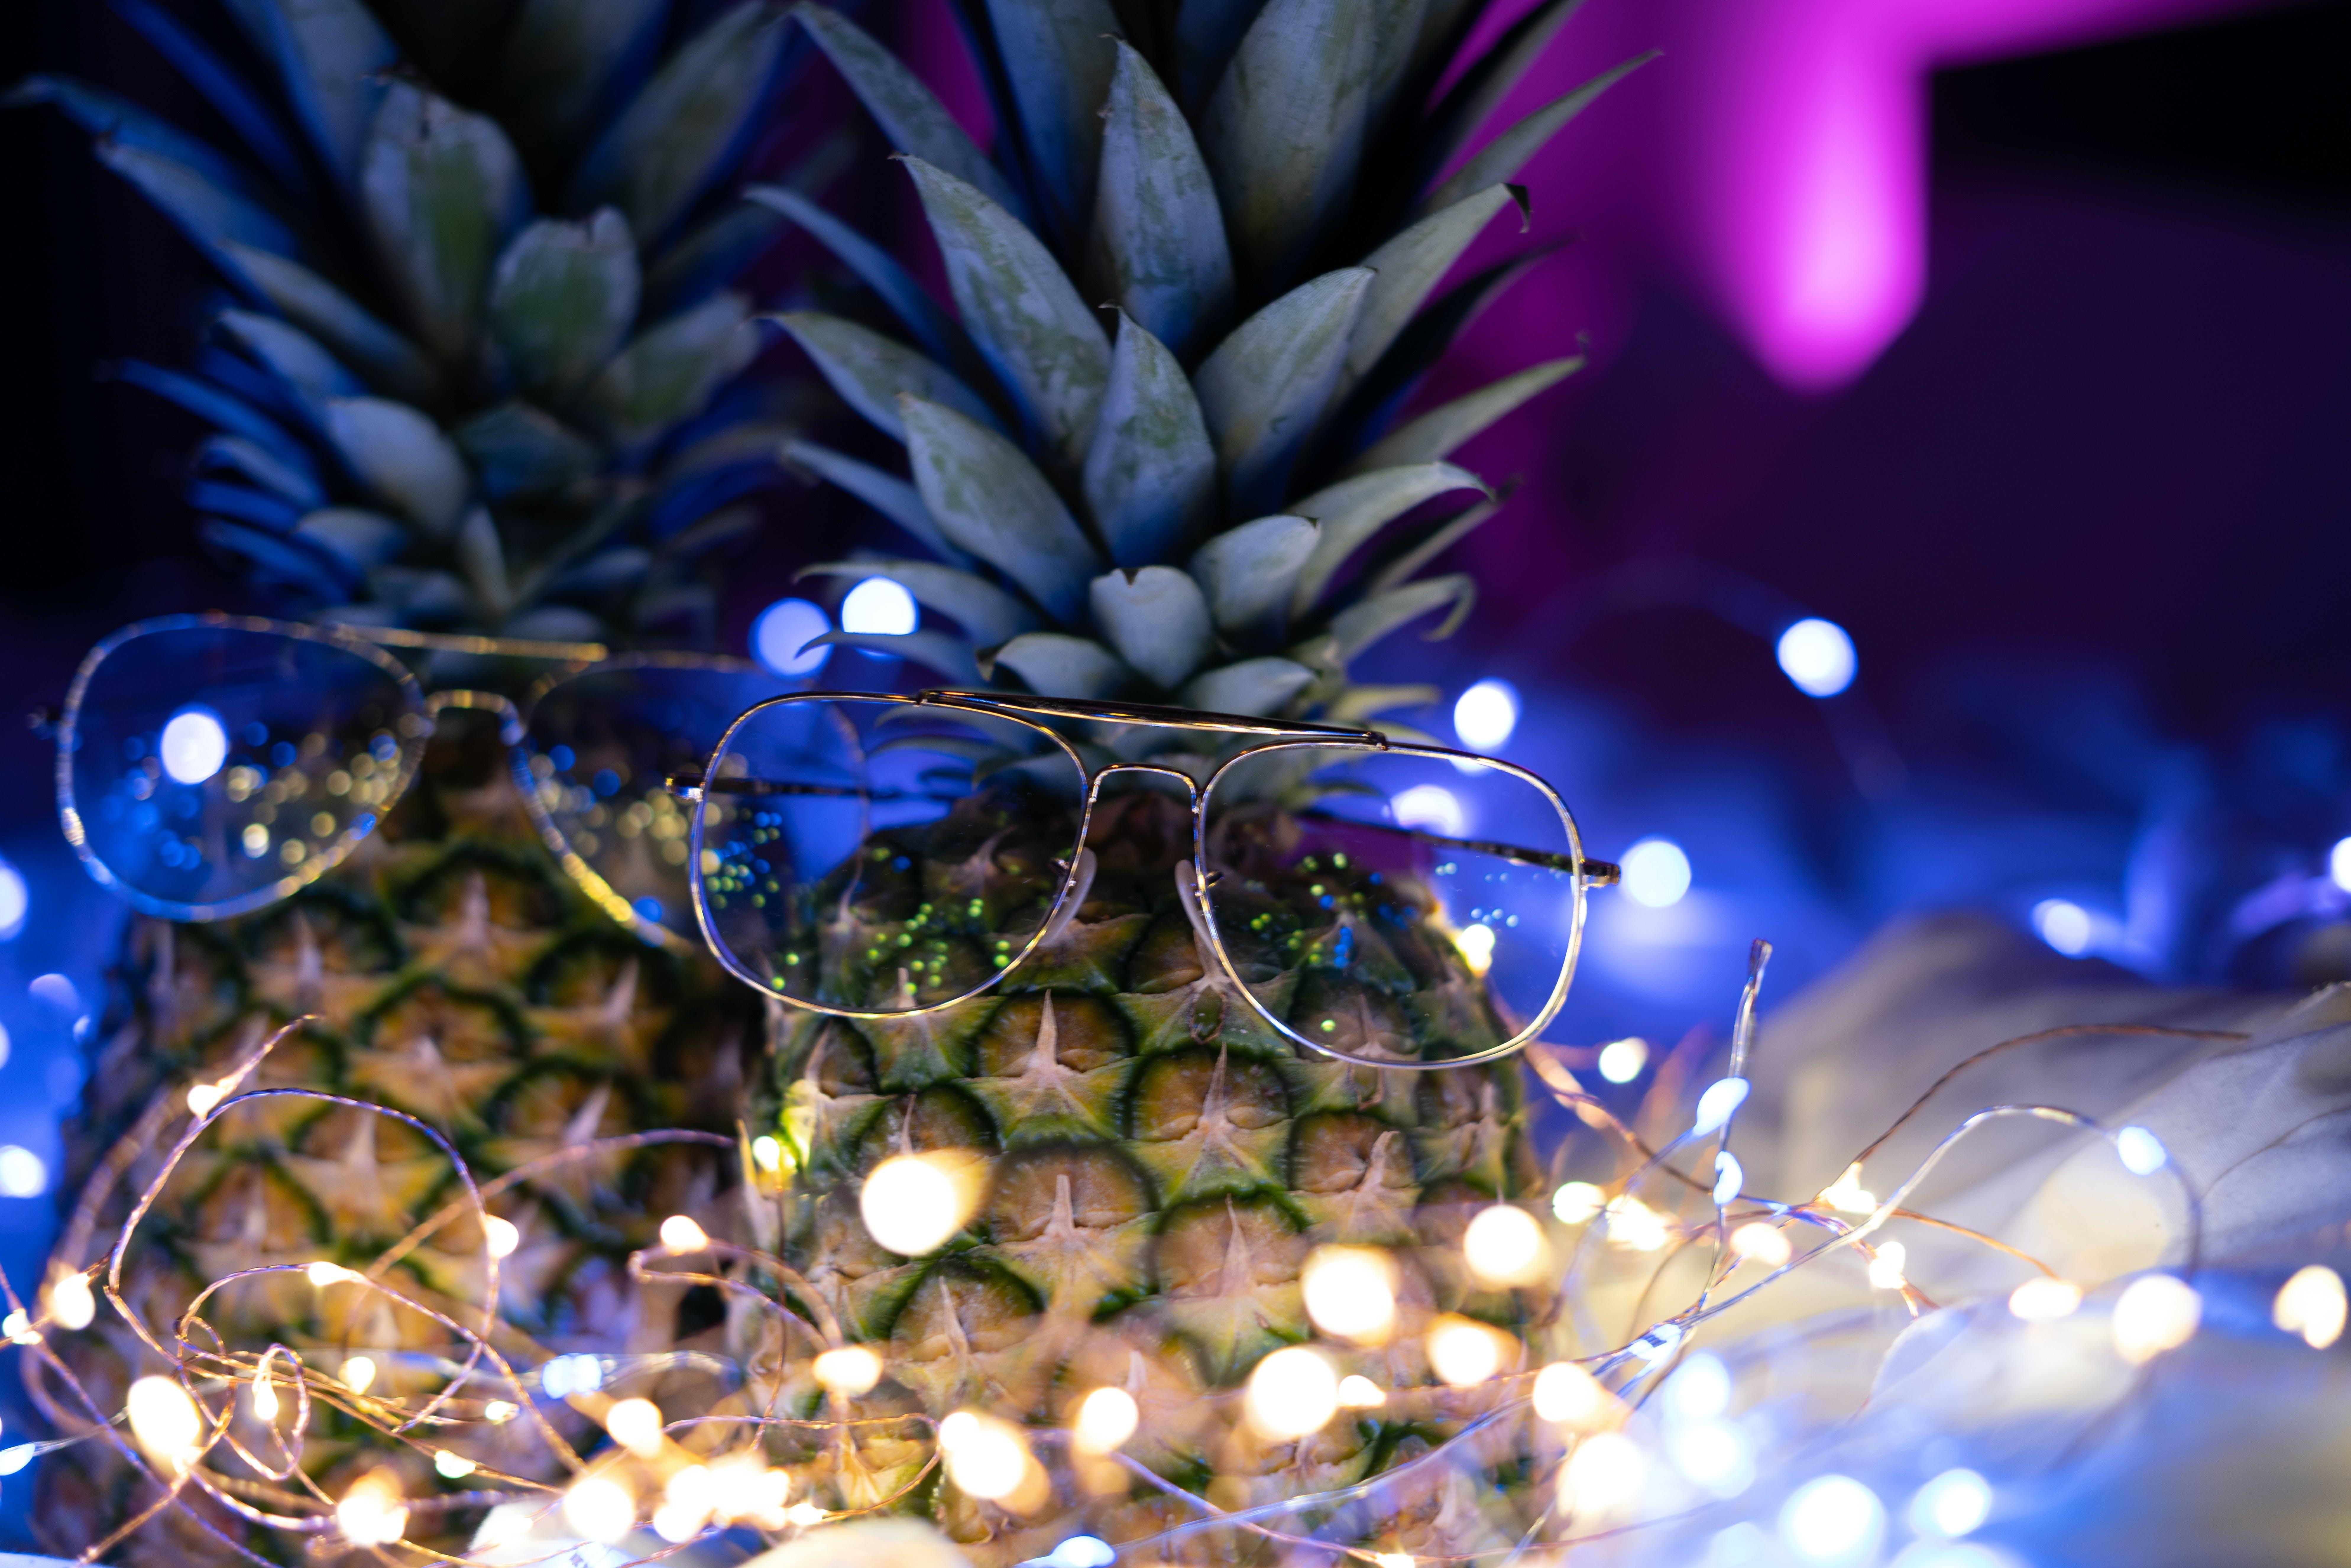 Free stock photo of camera, pineapple, neon, neon light